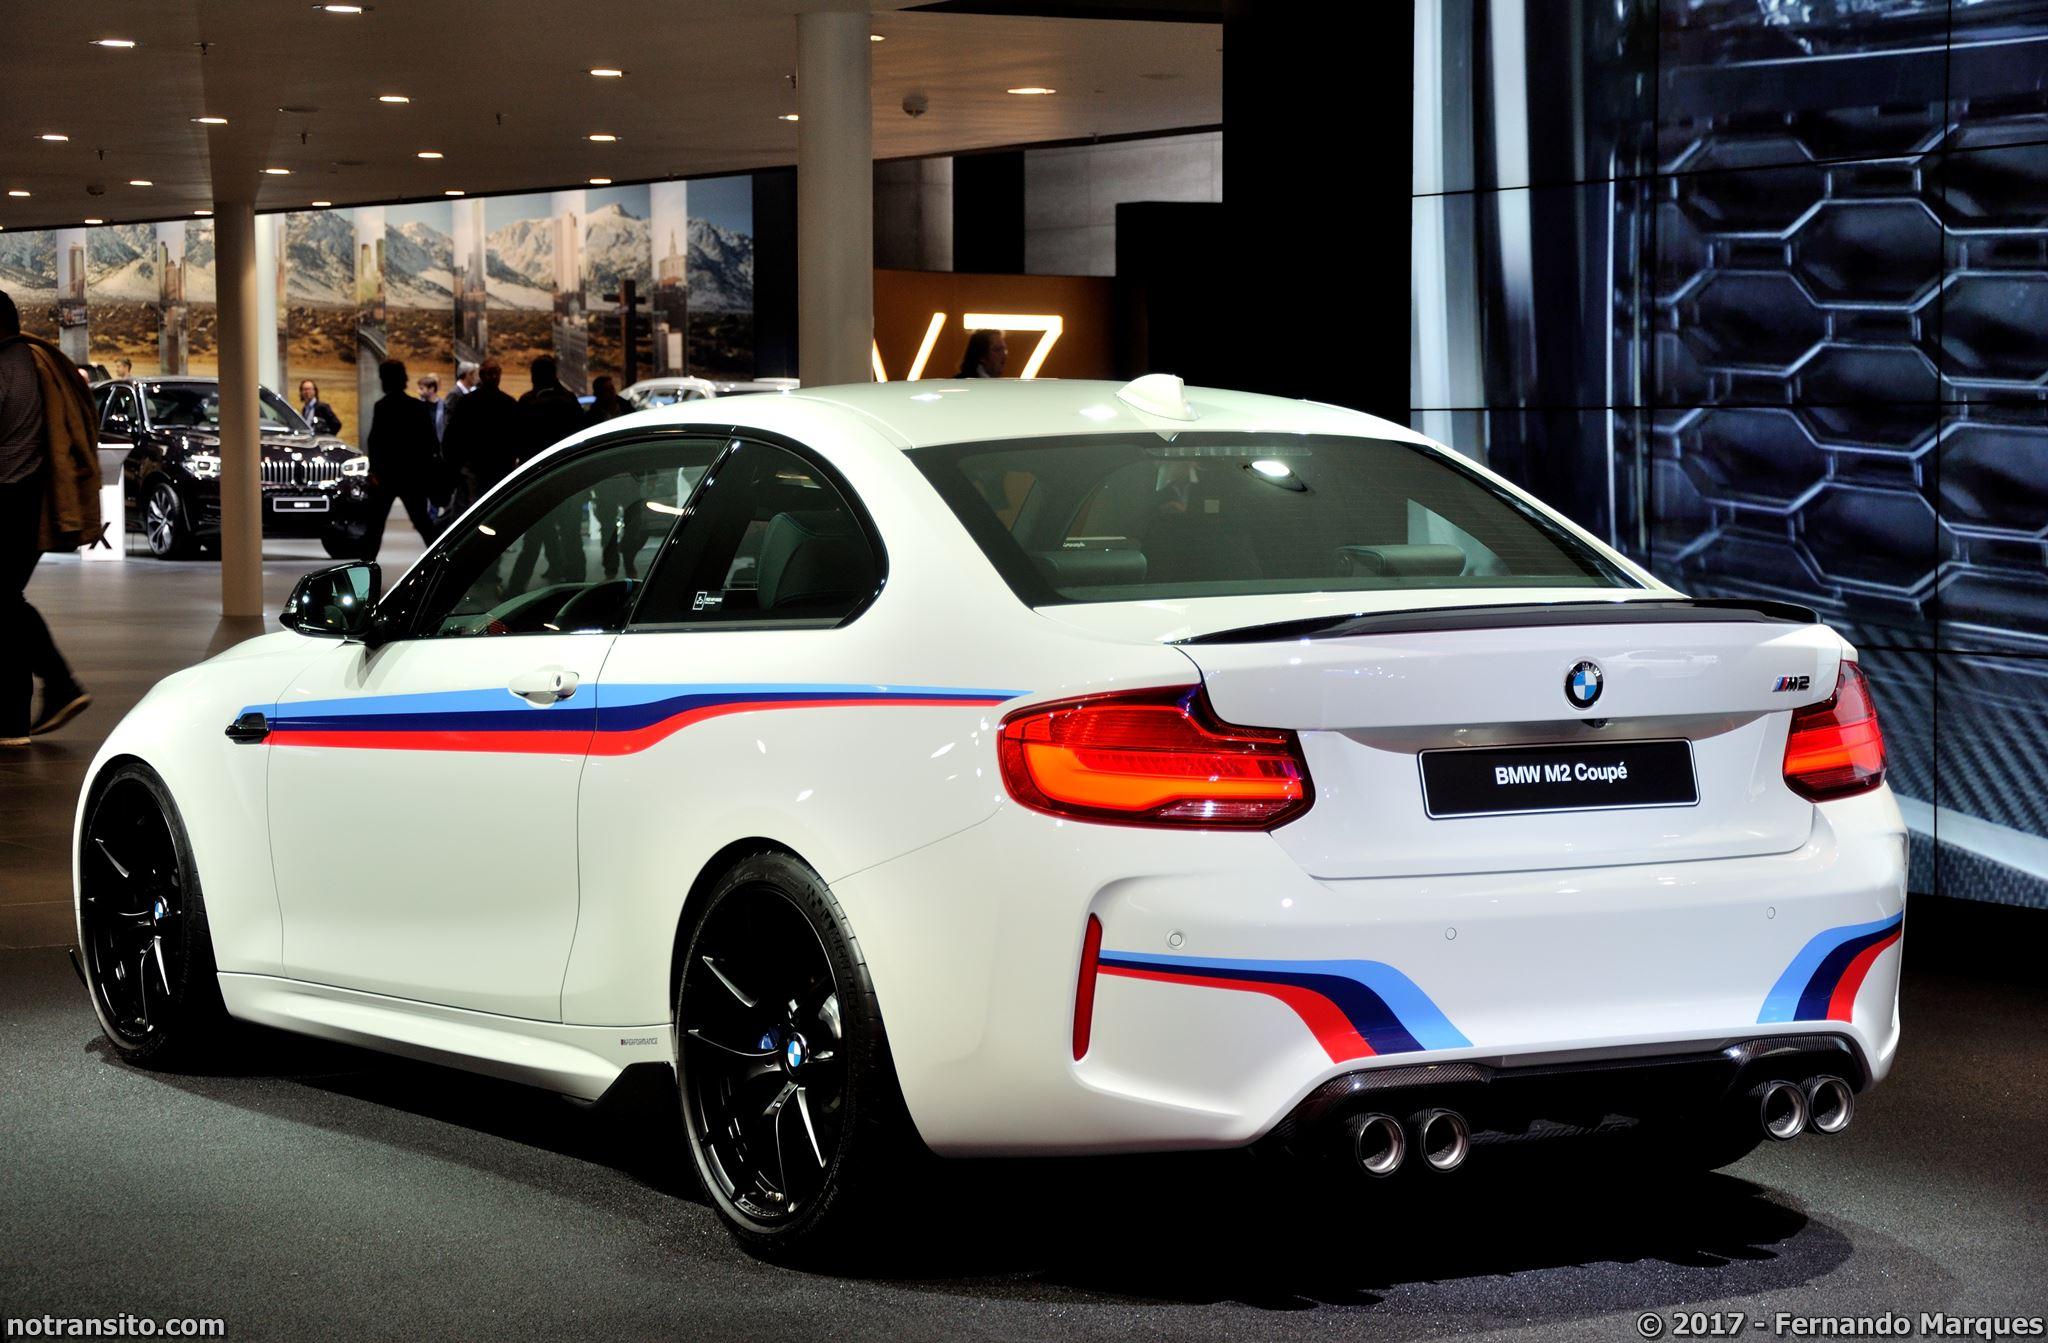 BMW-M2-Coupe-Frankfurt-2017-008